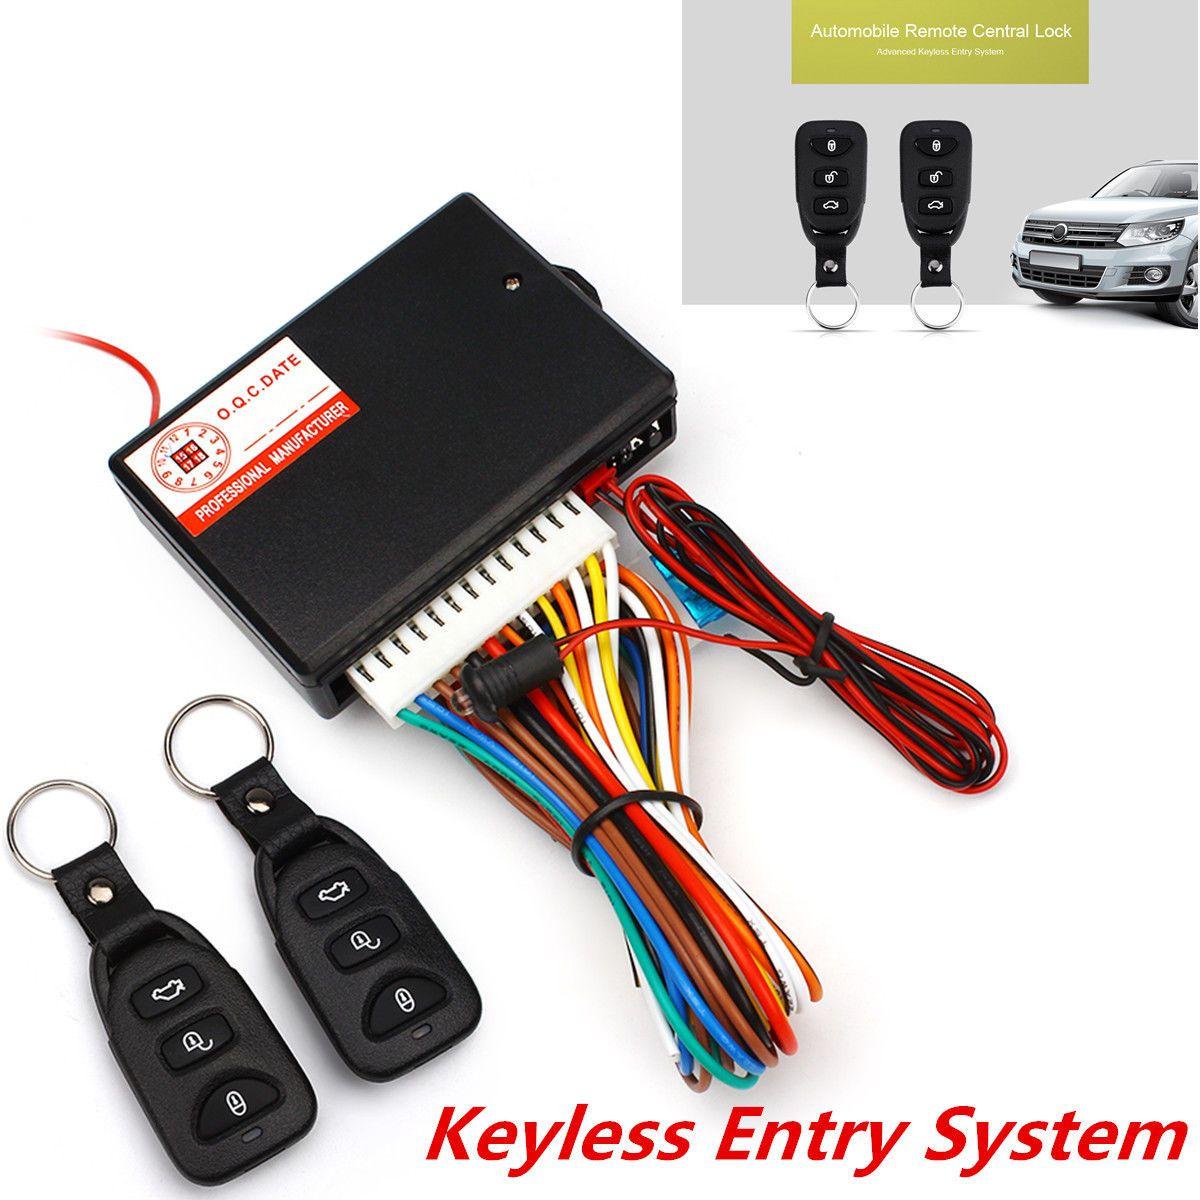 Awesome Great Car Autos Alarm Door Lock Unlock Vehicle Keyless Entry